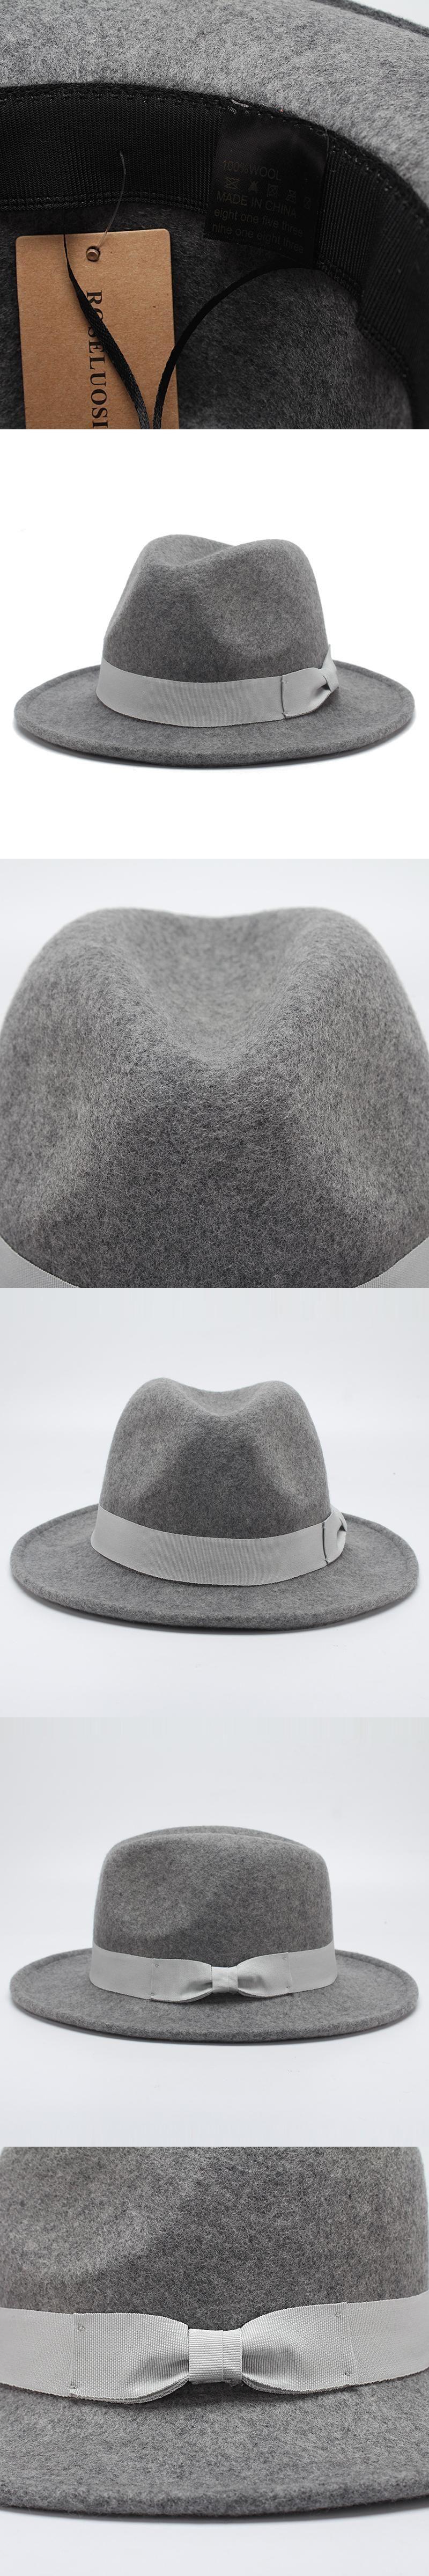 b303b1e9b787e ROSELUOSI Fashion Unisex Fedora Hats 2017 Autumn Winter Wool Panama Hat For Women  Men Casaul Bow